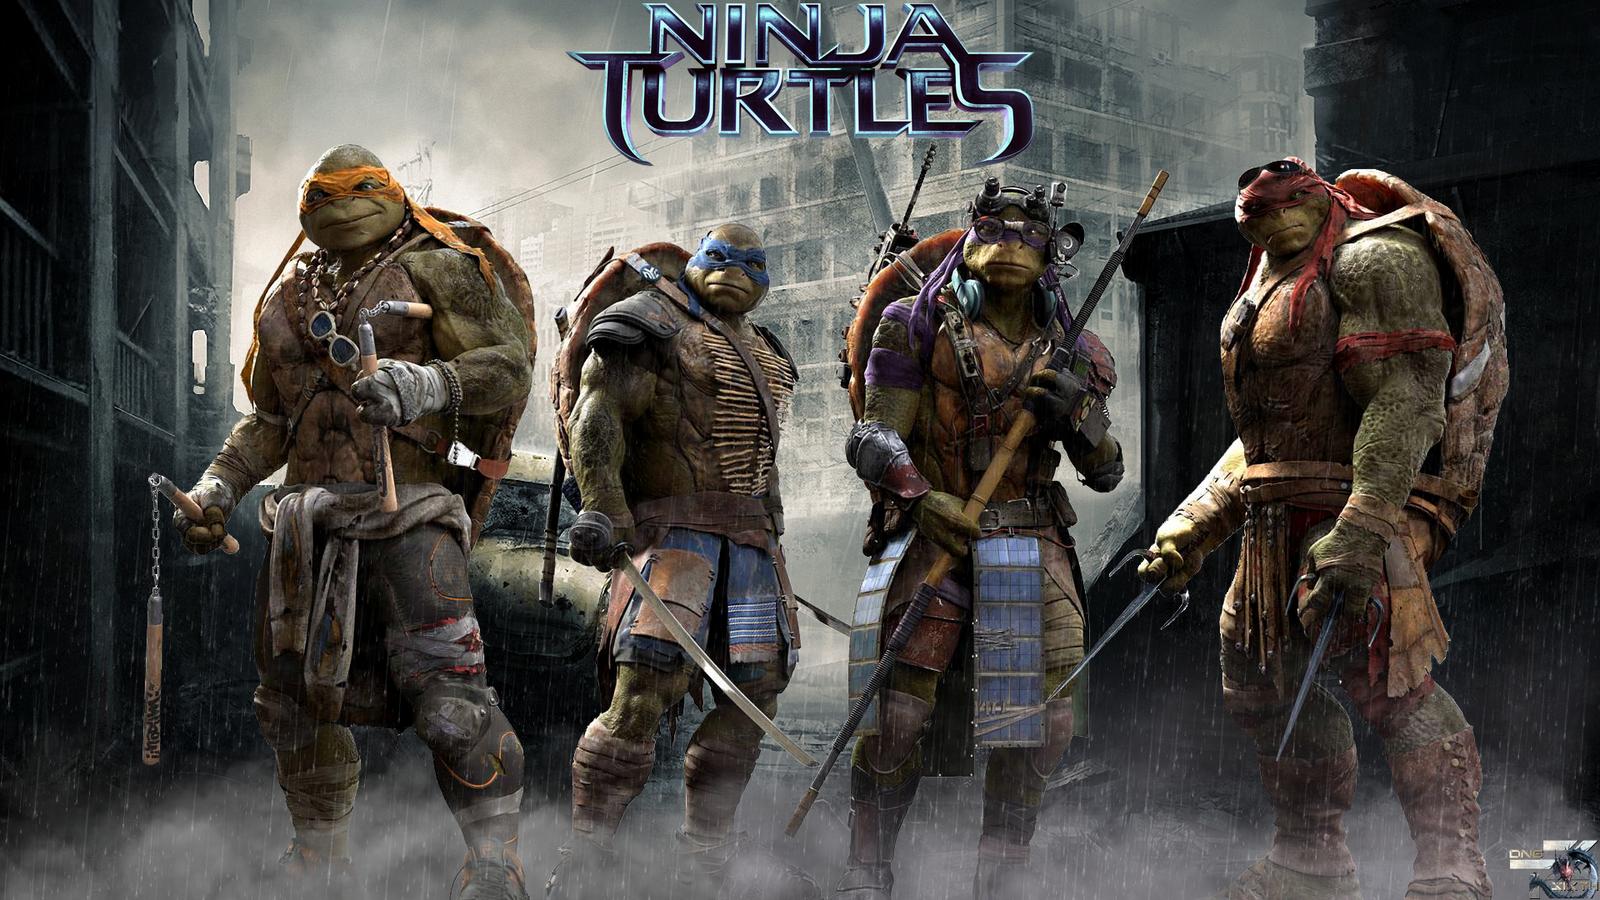 Teenage Mutant Ninja Turtles Fanart By Davidcdesigns On